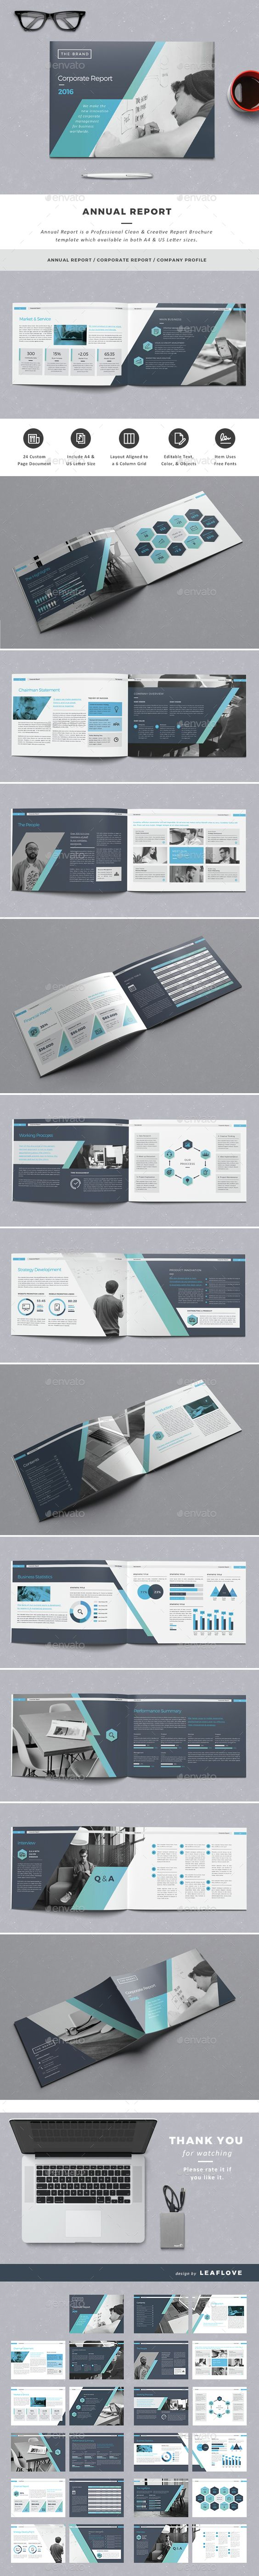 Annual Report - Corporate Brochures                                                                                                                                                     More